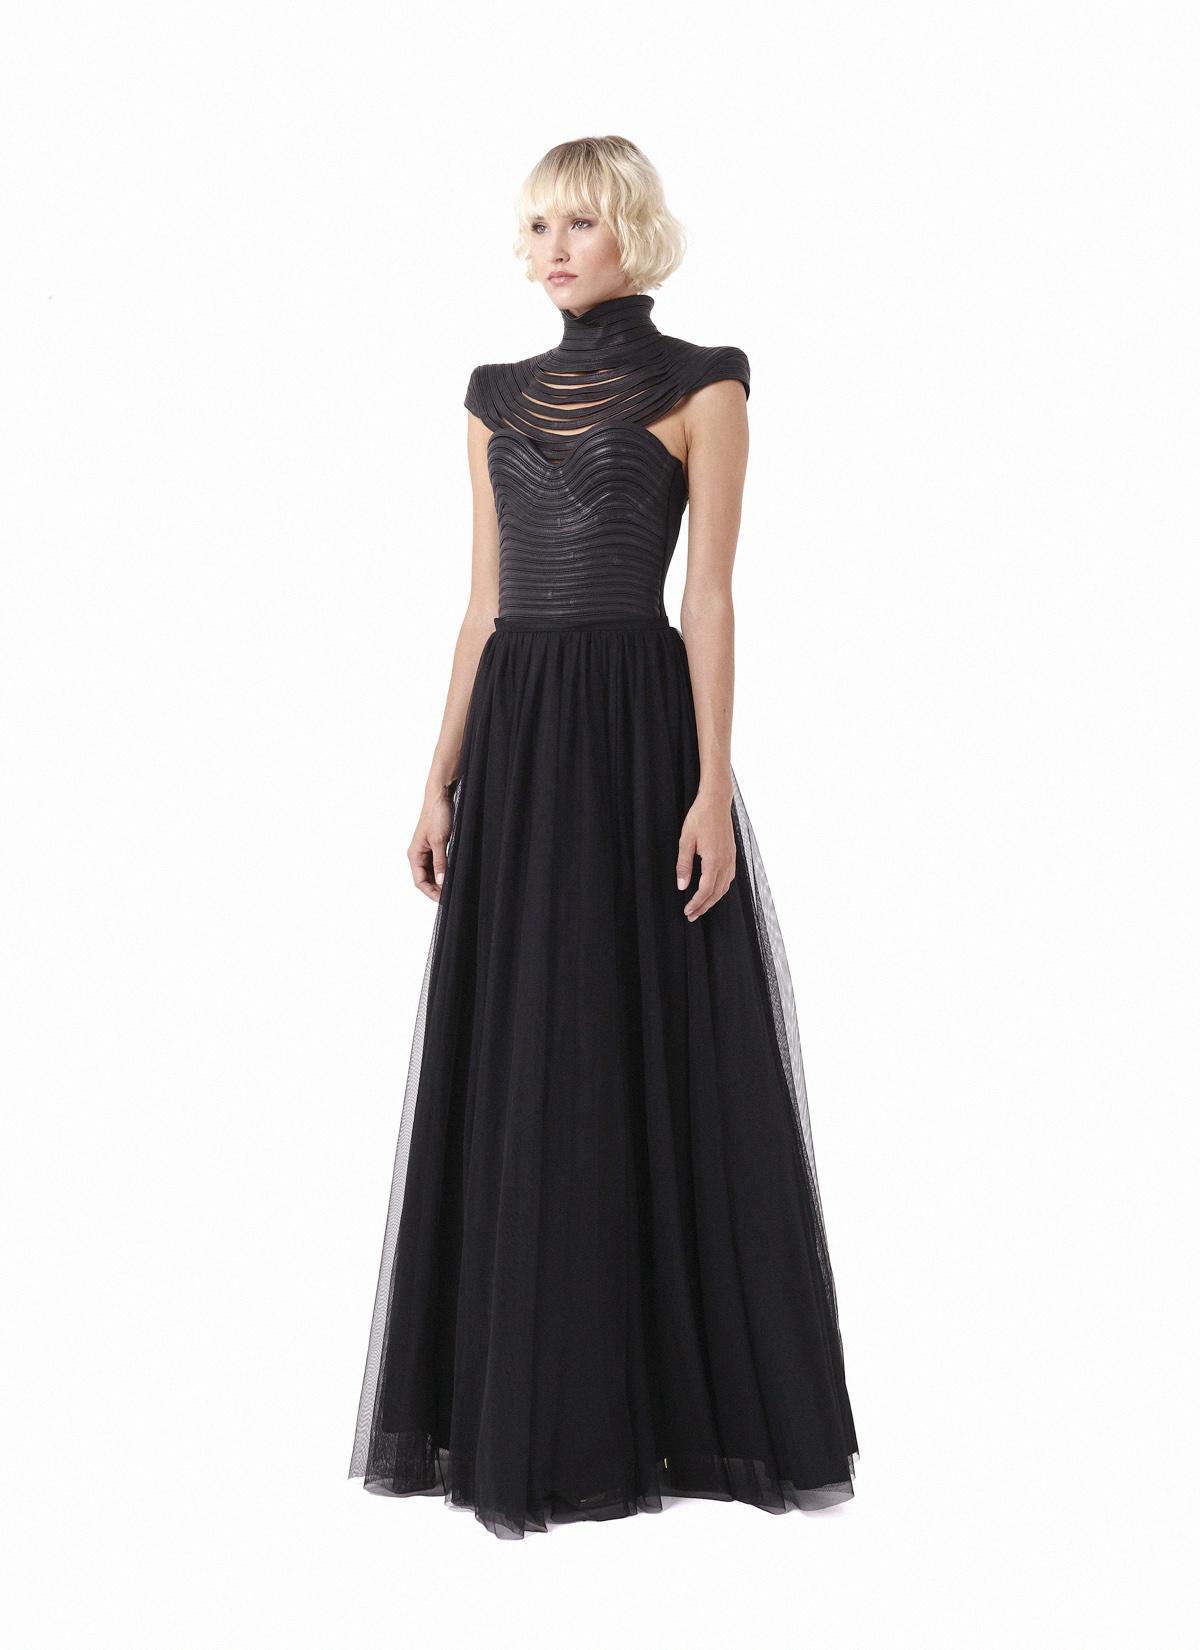 Obsidian shoulders, Obsidian corset & Hornblende skirt